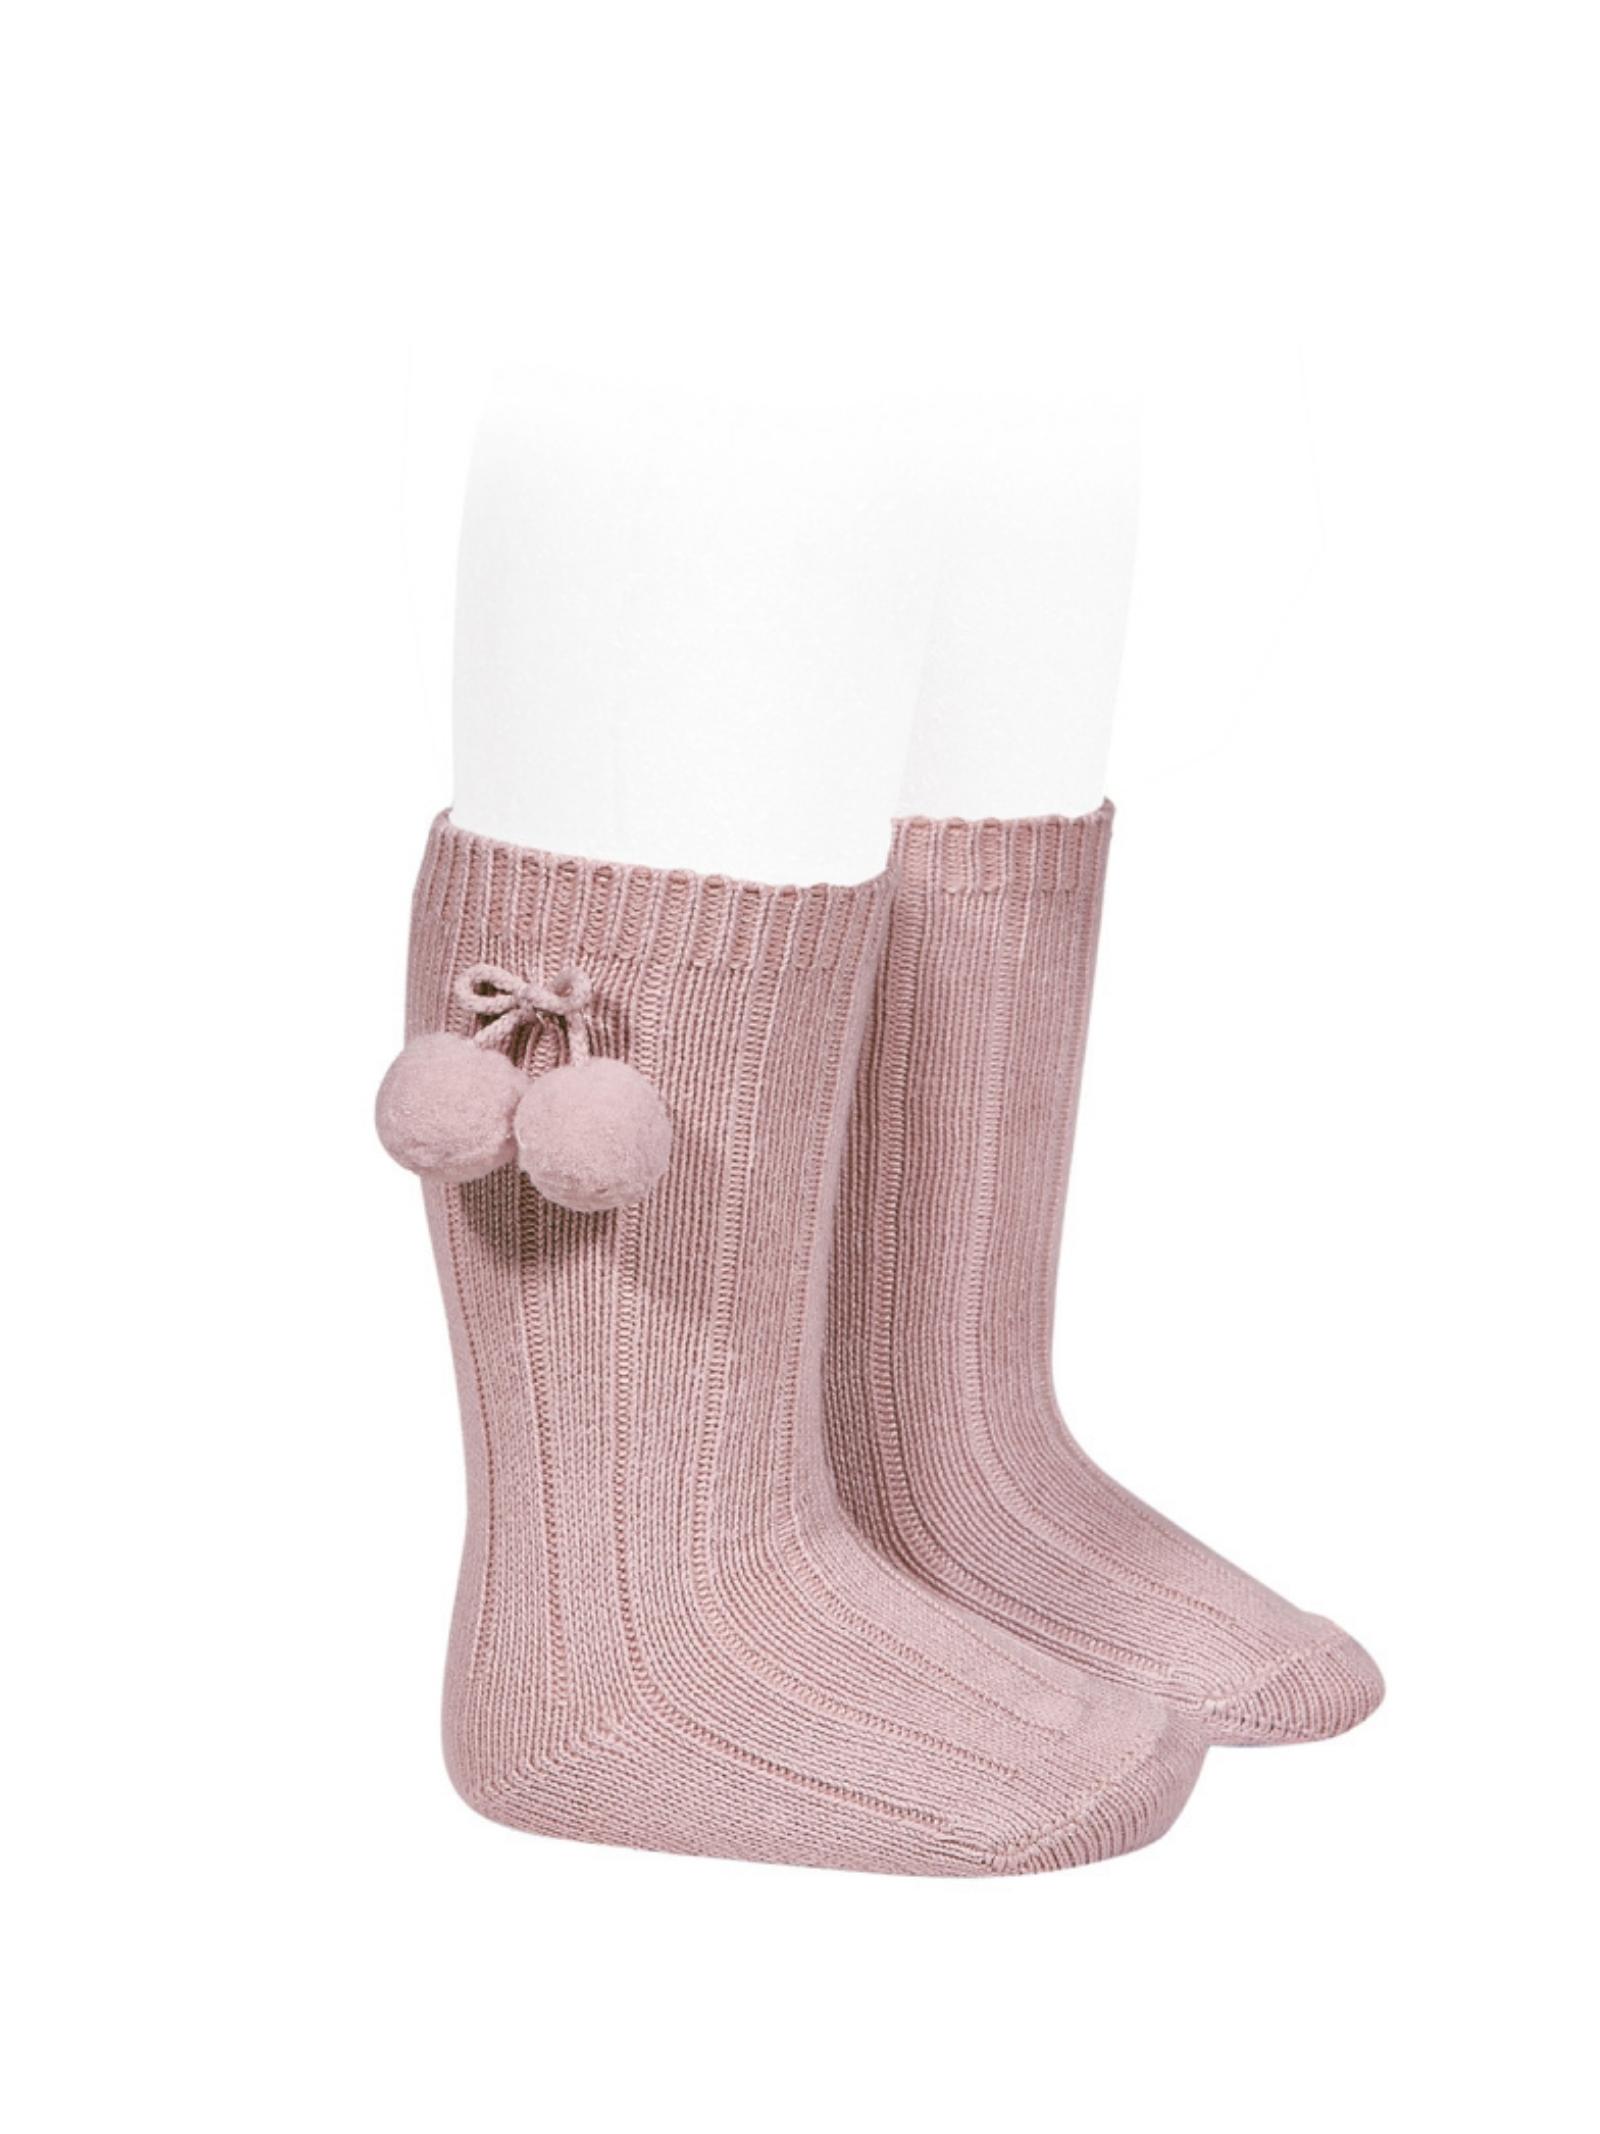 Ribbed Pompon Socks for Girls CONDOR | Socks | 30152526